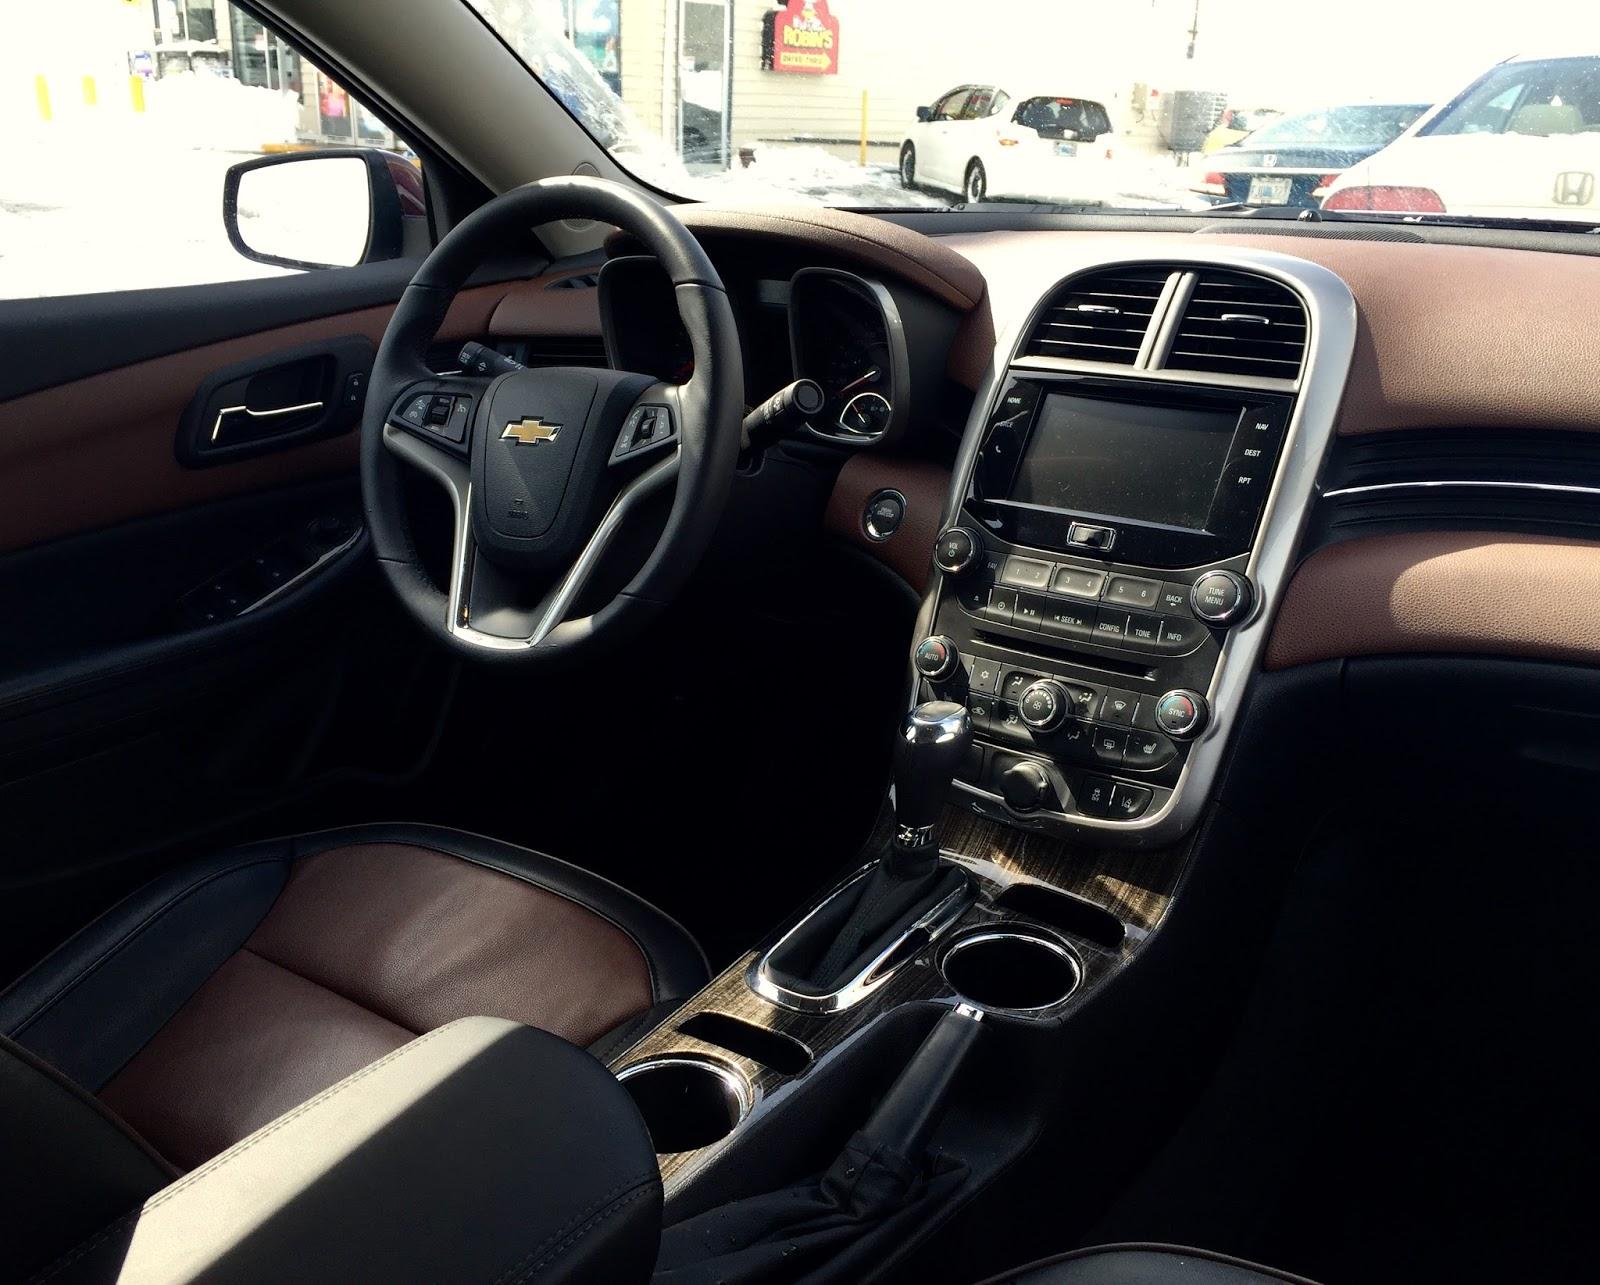 2015 Chevrolet Malibu LTZ 1LZ interior